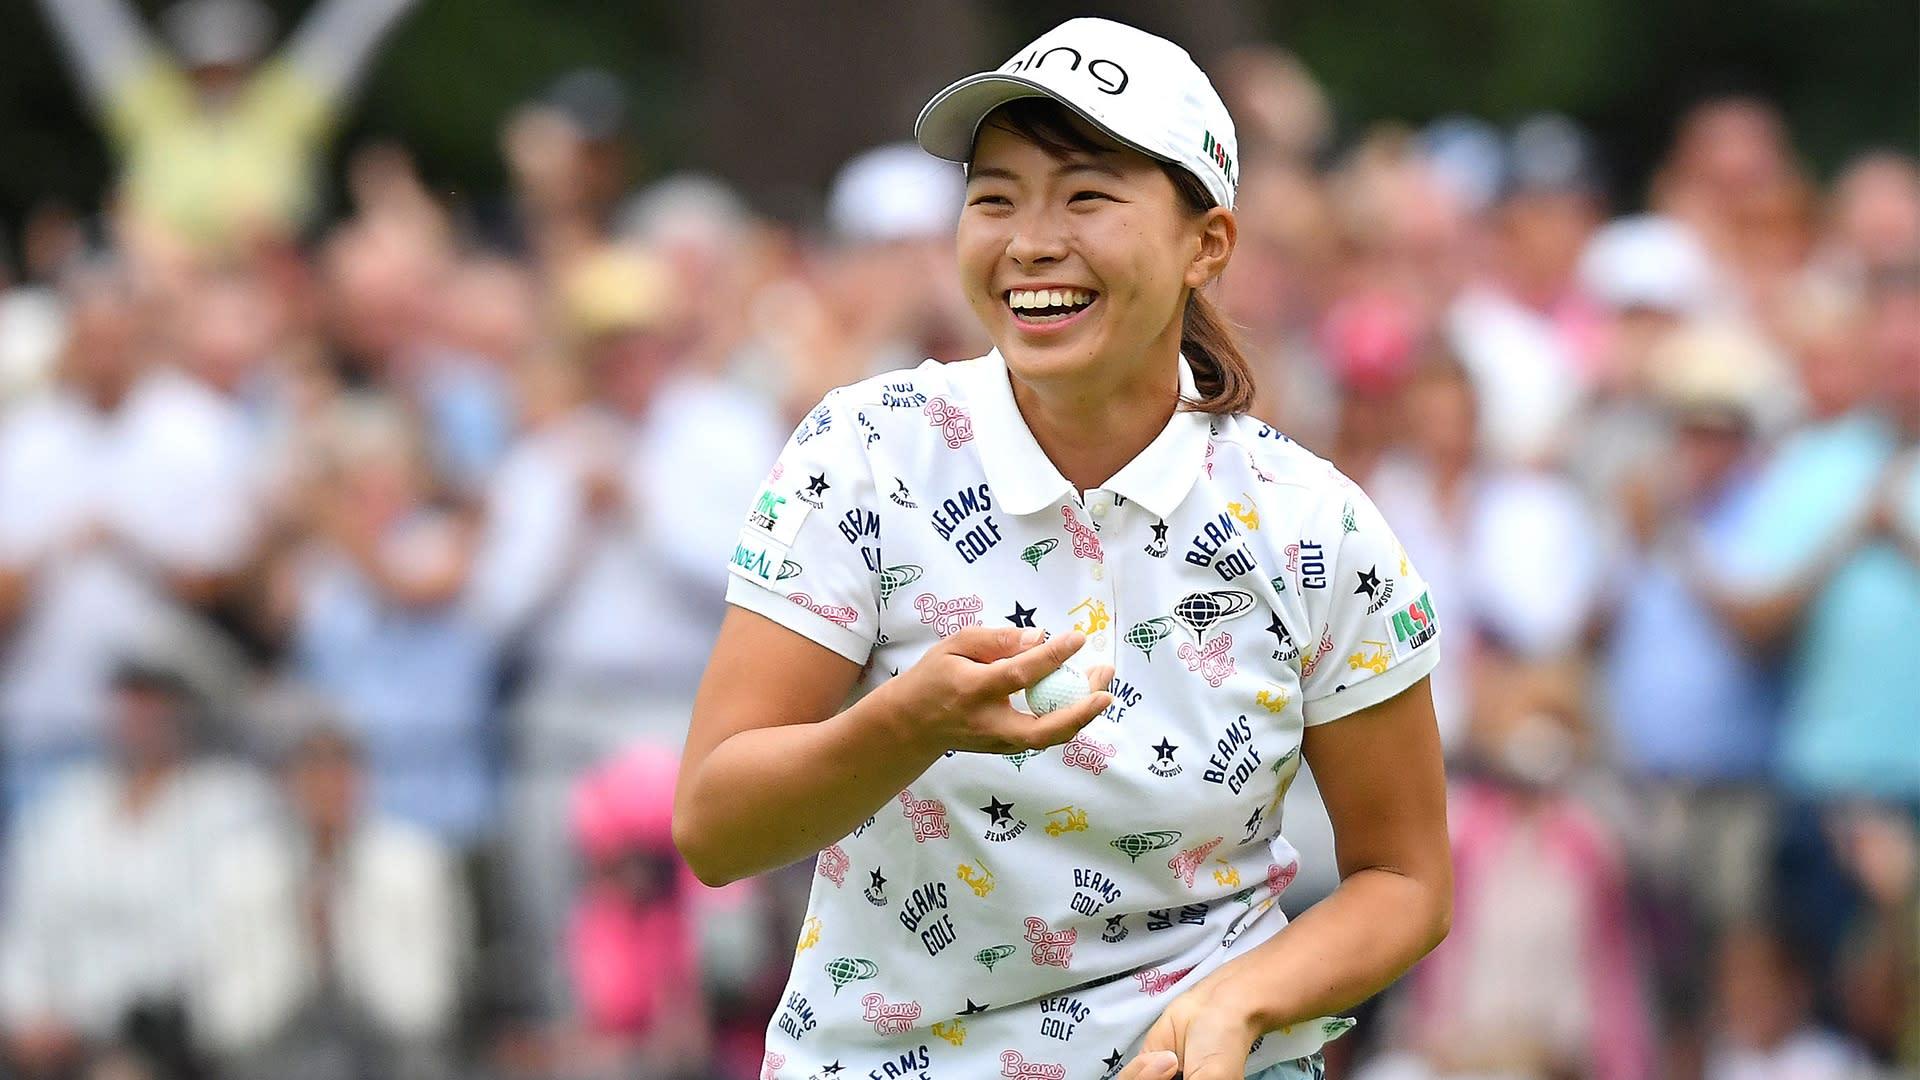 'Smiling Cinderella' Shibuno returns to LPGA at Swinging Skirts